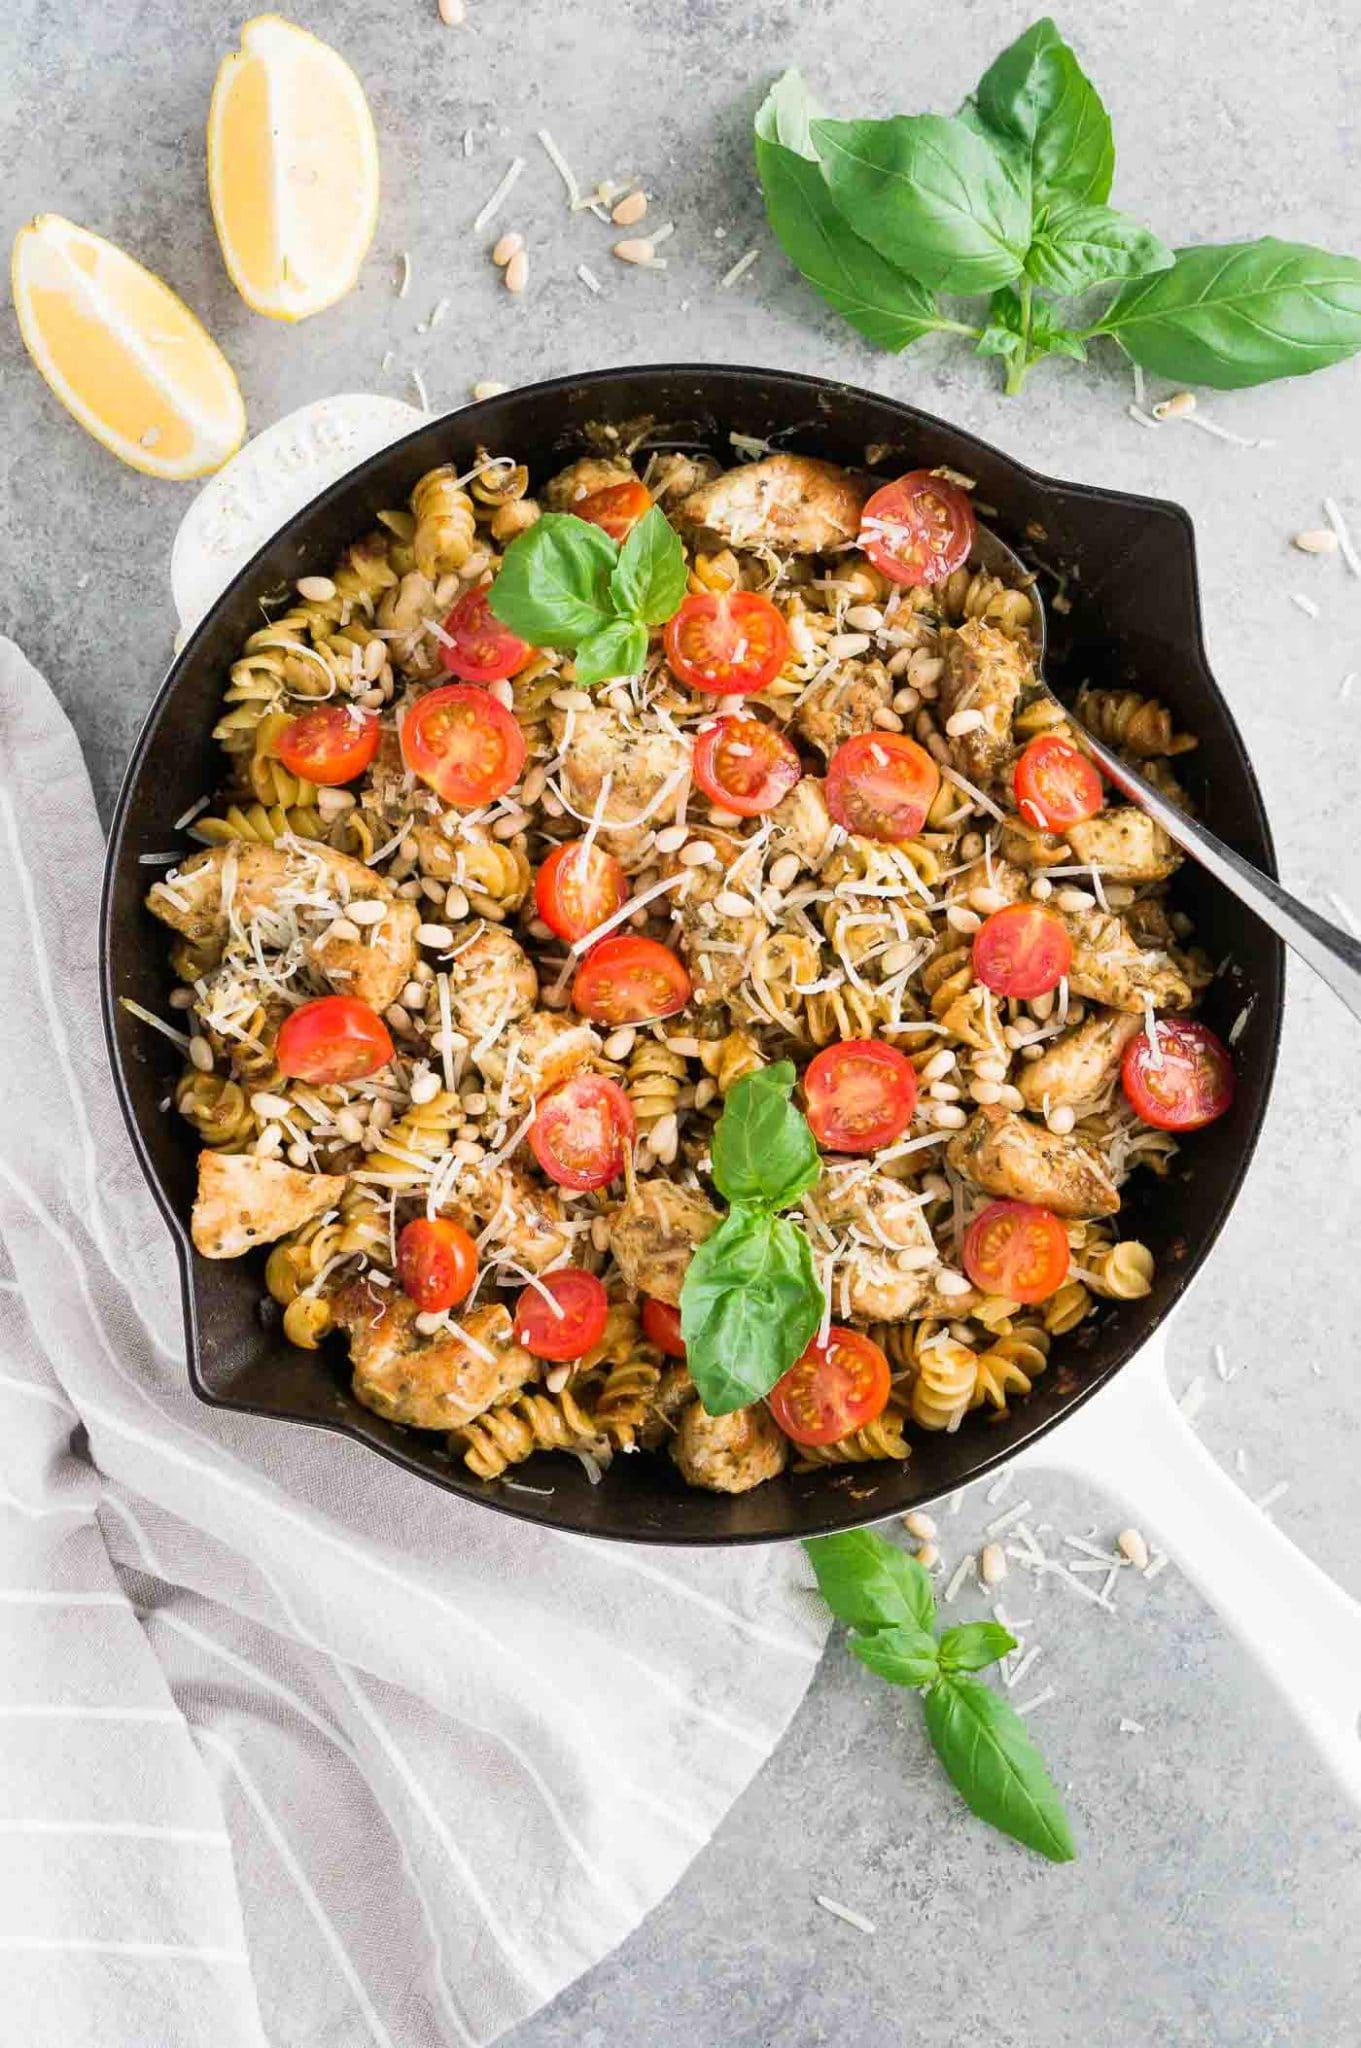 chicken pesto pasta skillet with cherry tomatoes